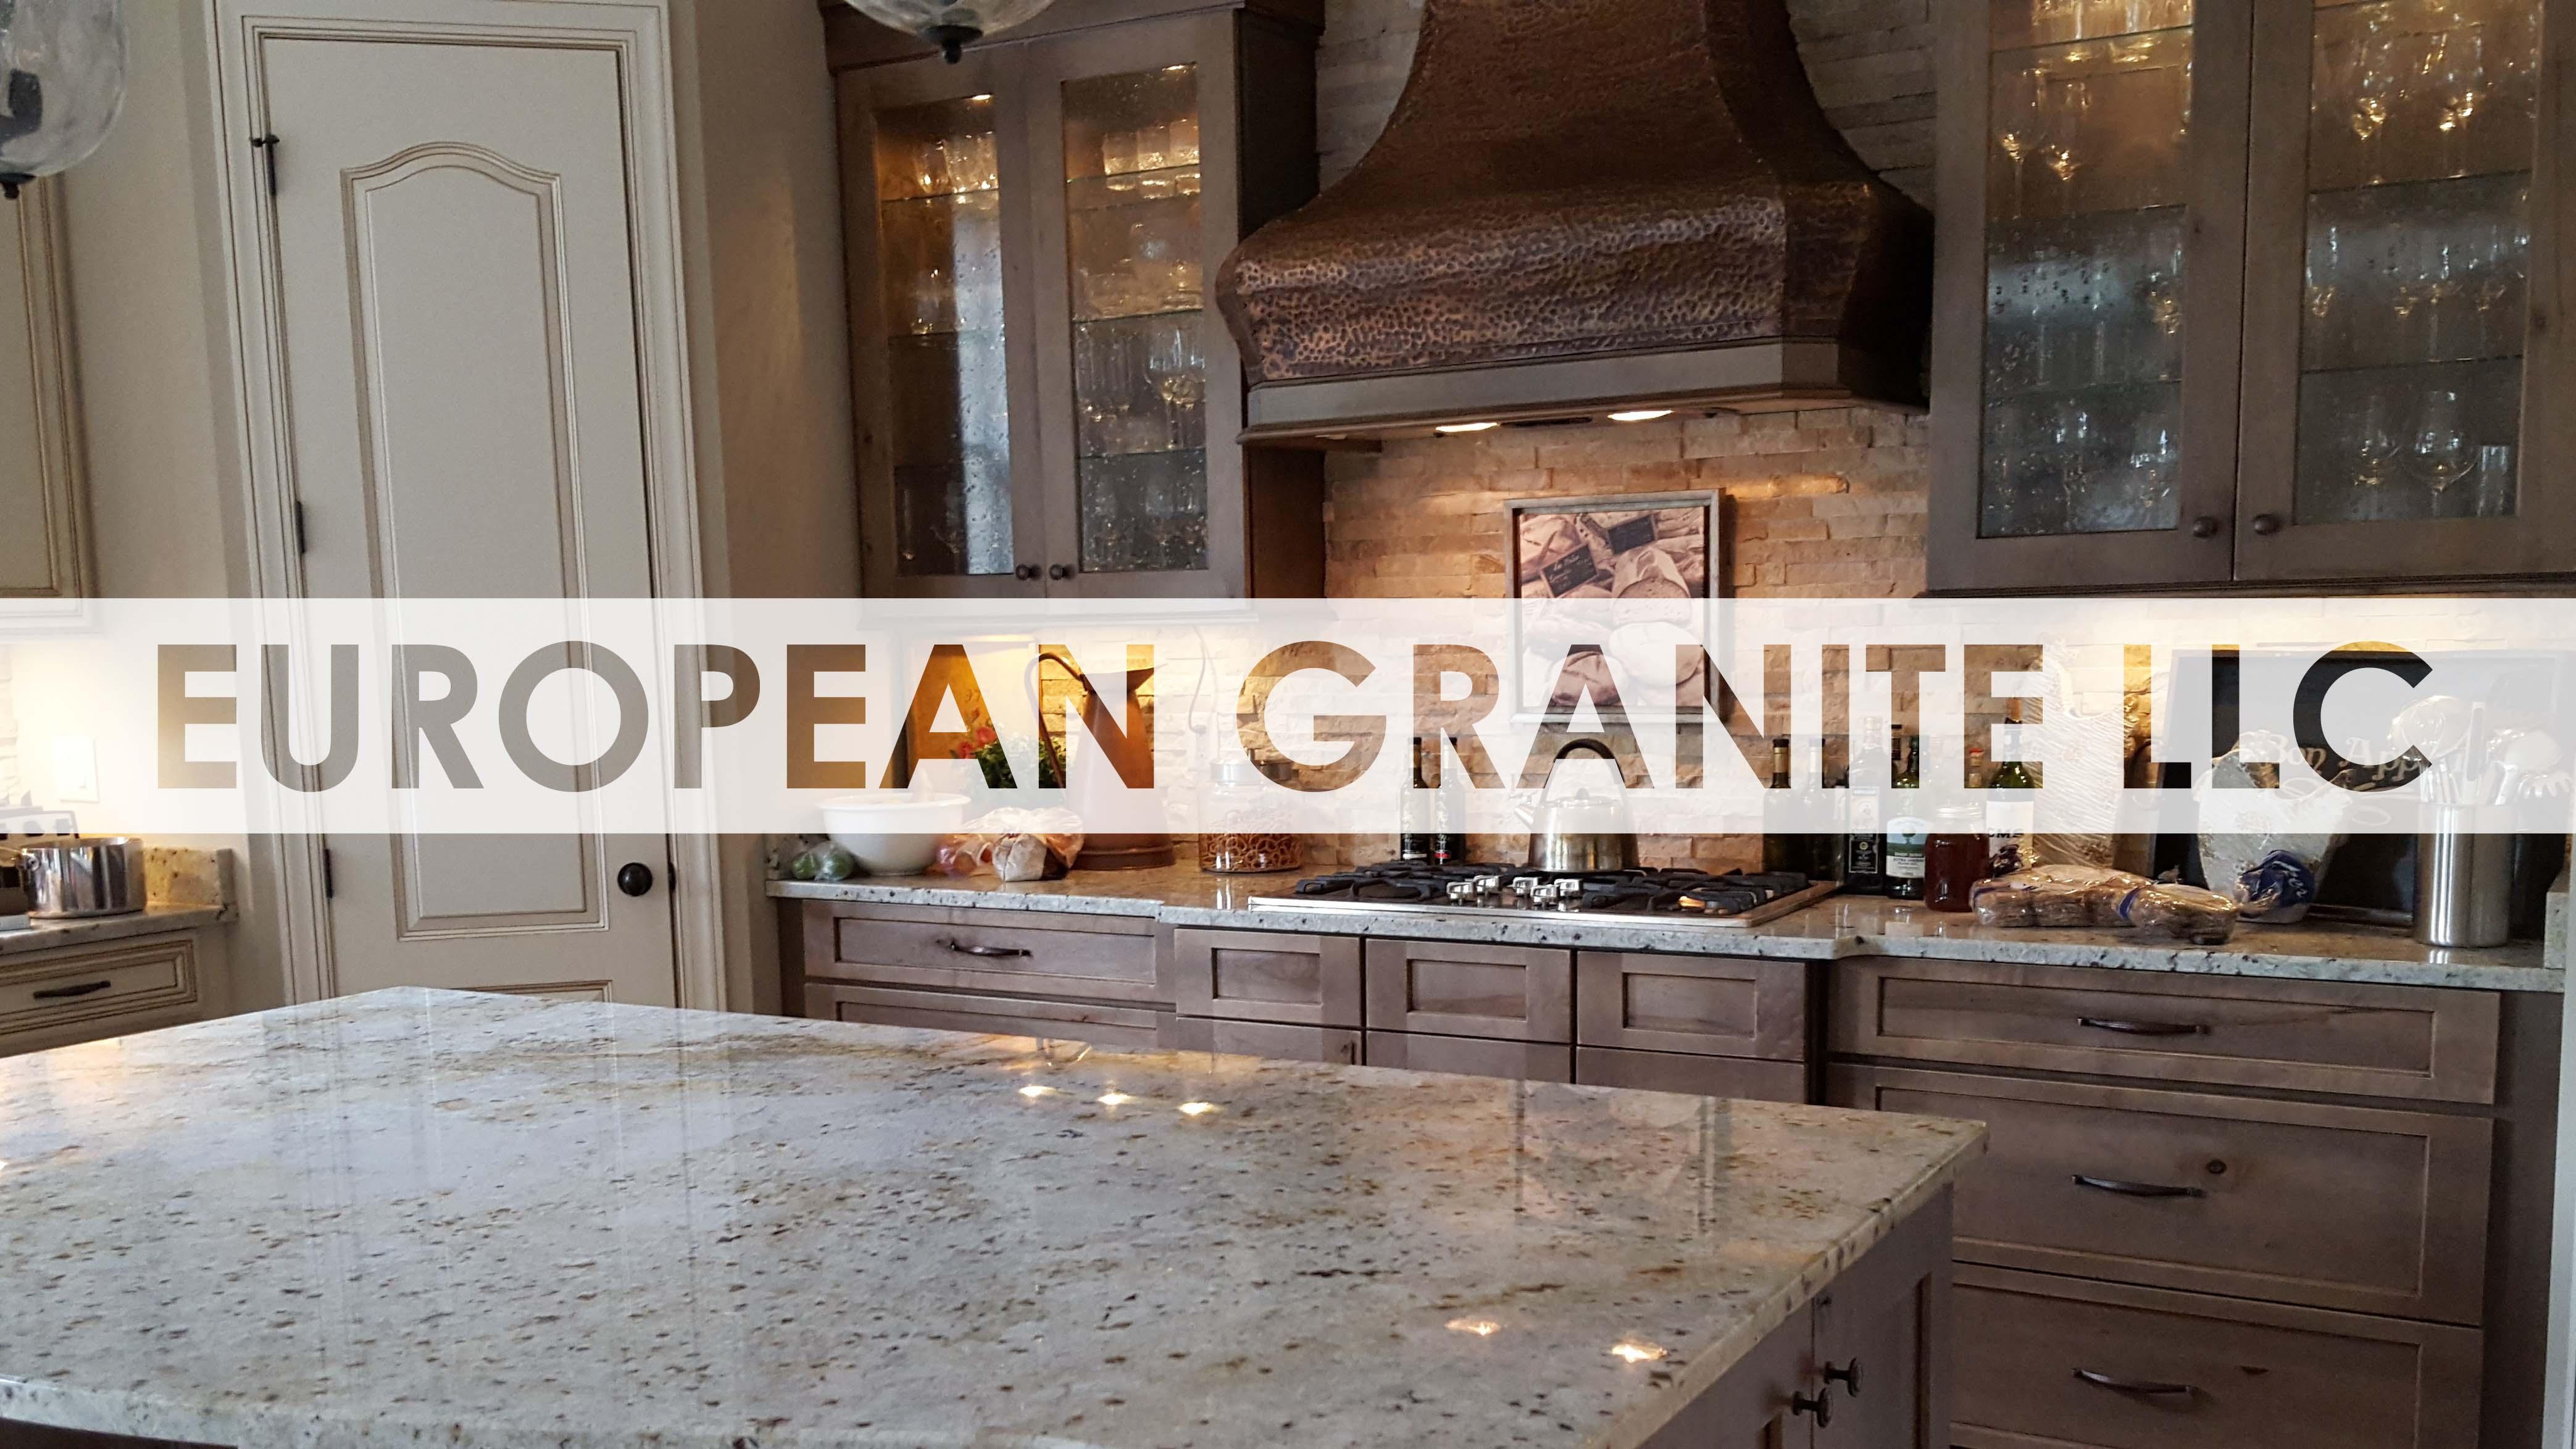 Charmant Granite Countertops | Spartanburg, SC | European Granite LLC